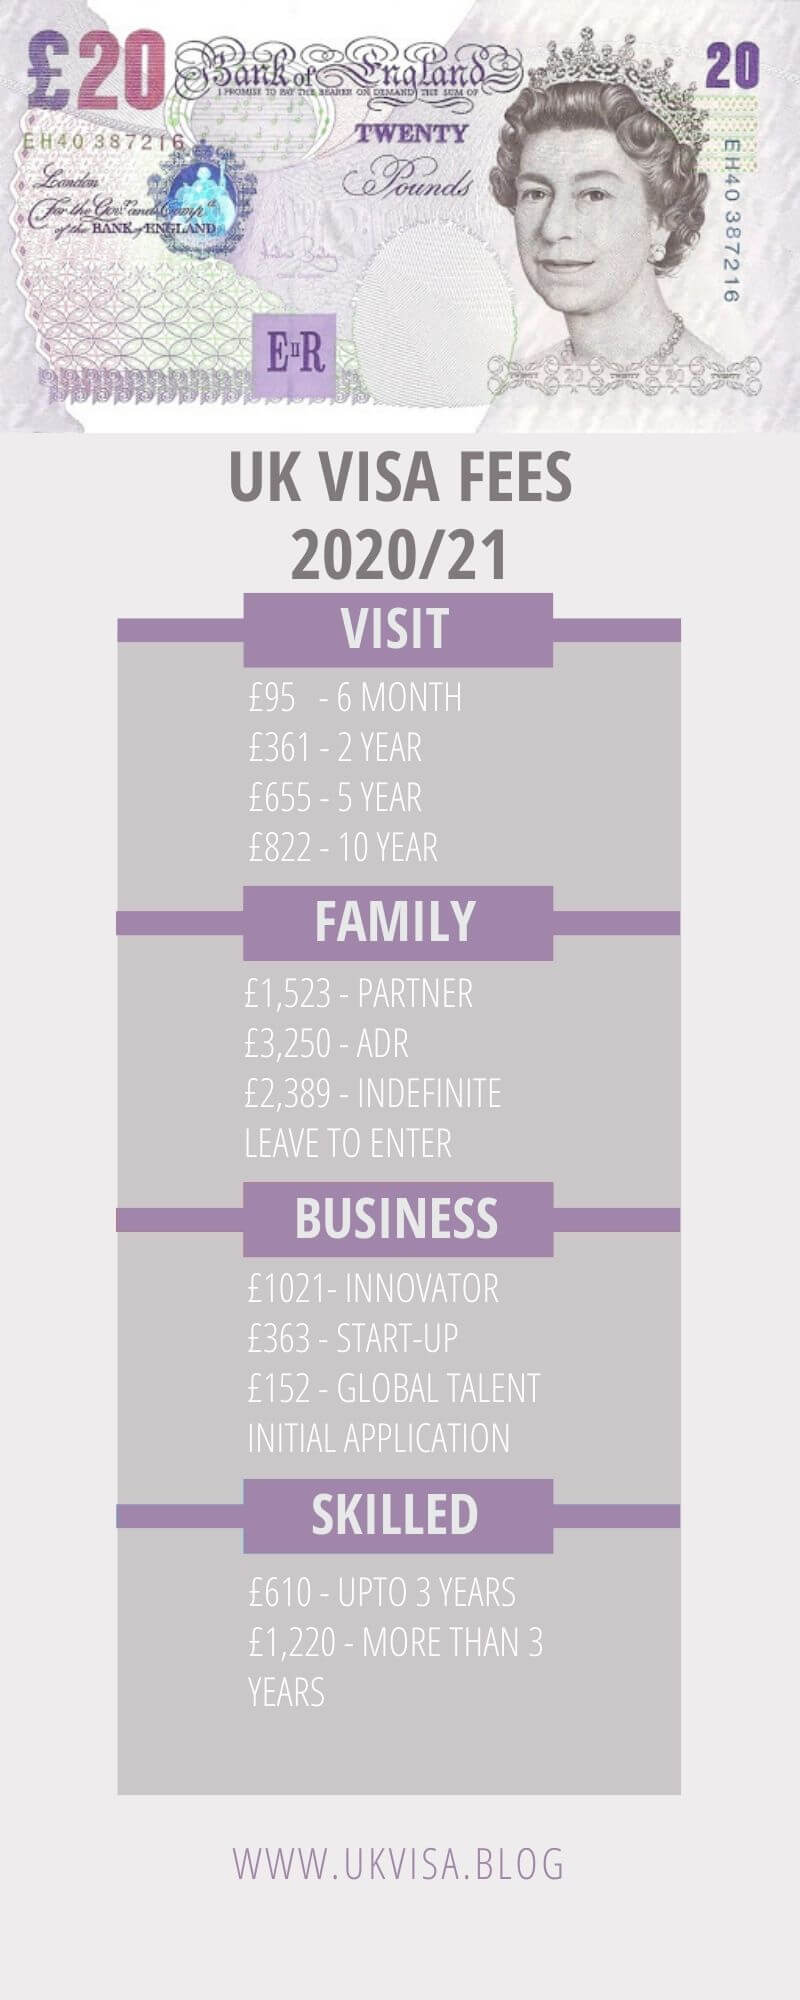 UK Visit, Tourist, Spouse, Work, Student Visa Fees 2020